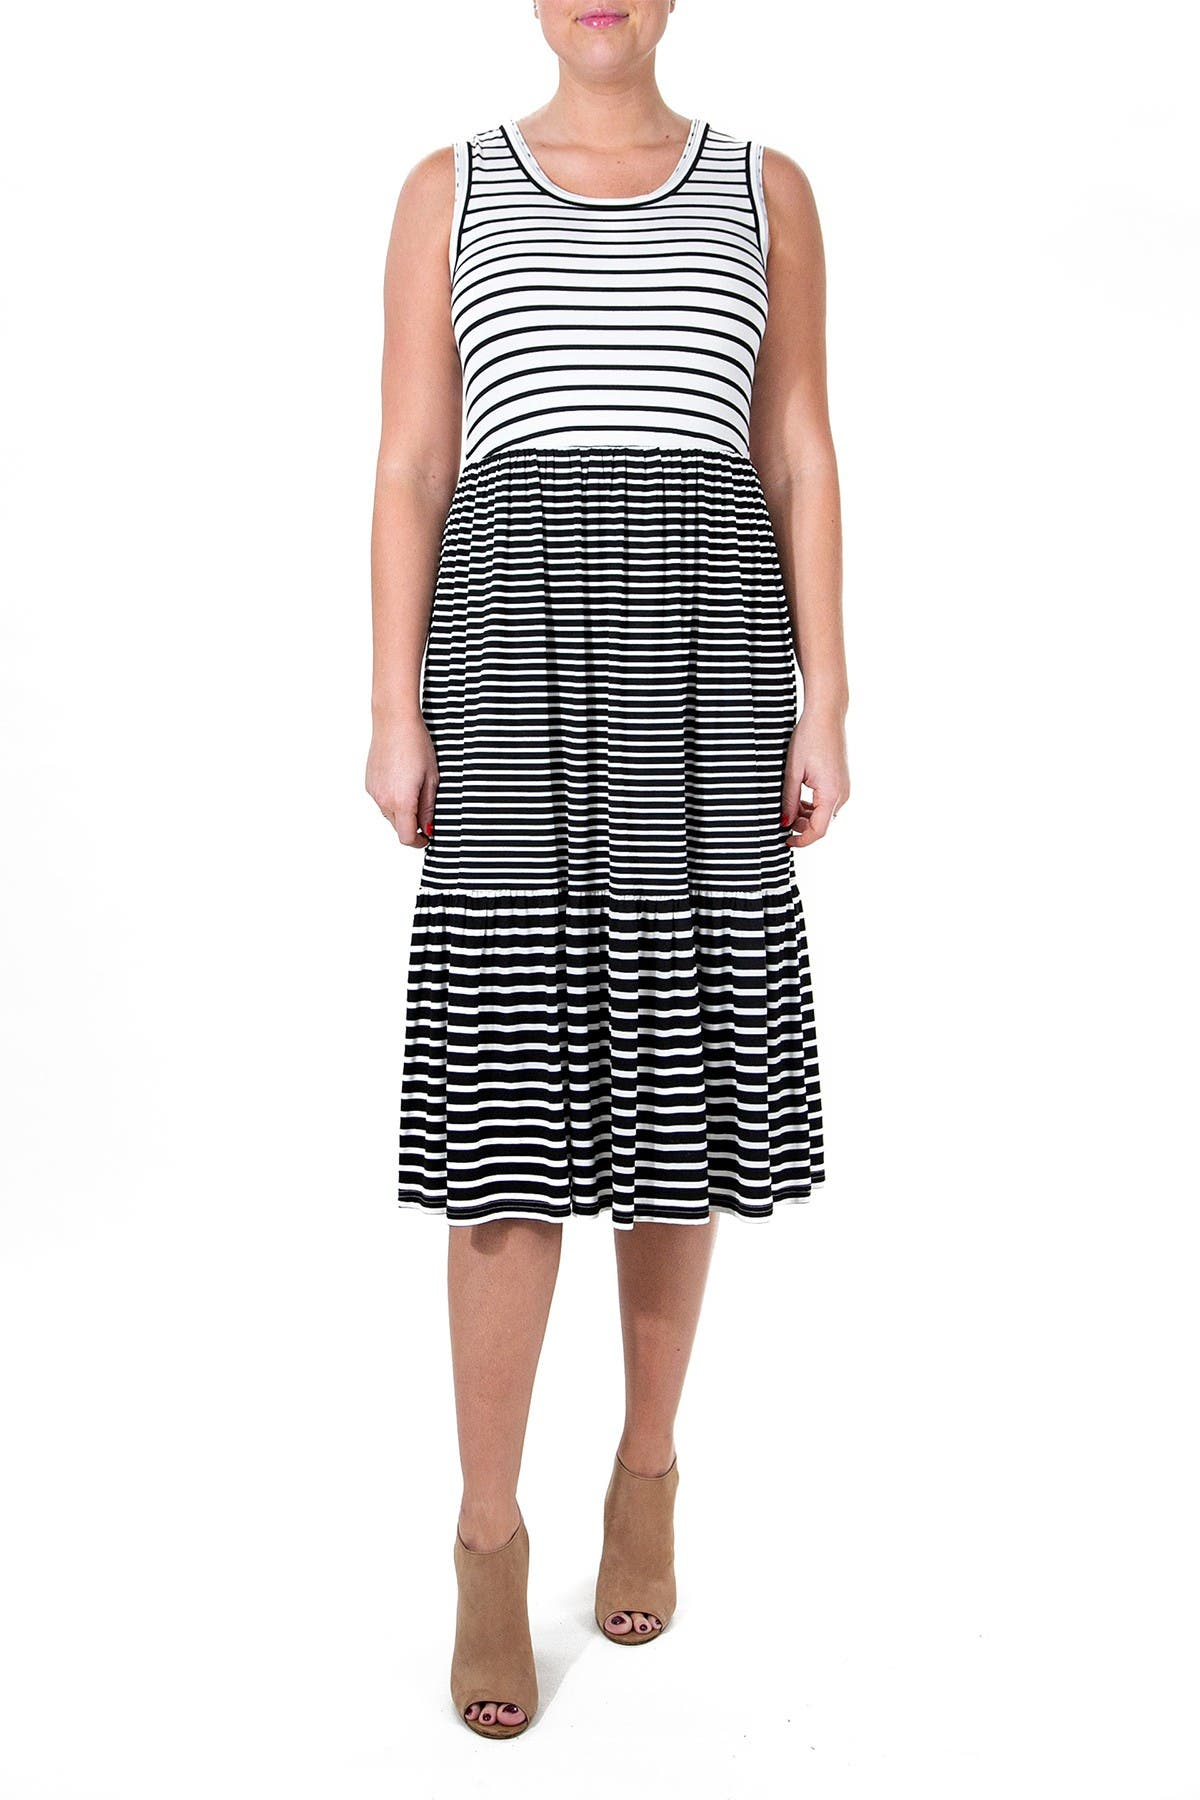 Image of Nina Leonard Mixed Stripe Scoop Neck Midi Tank Dress